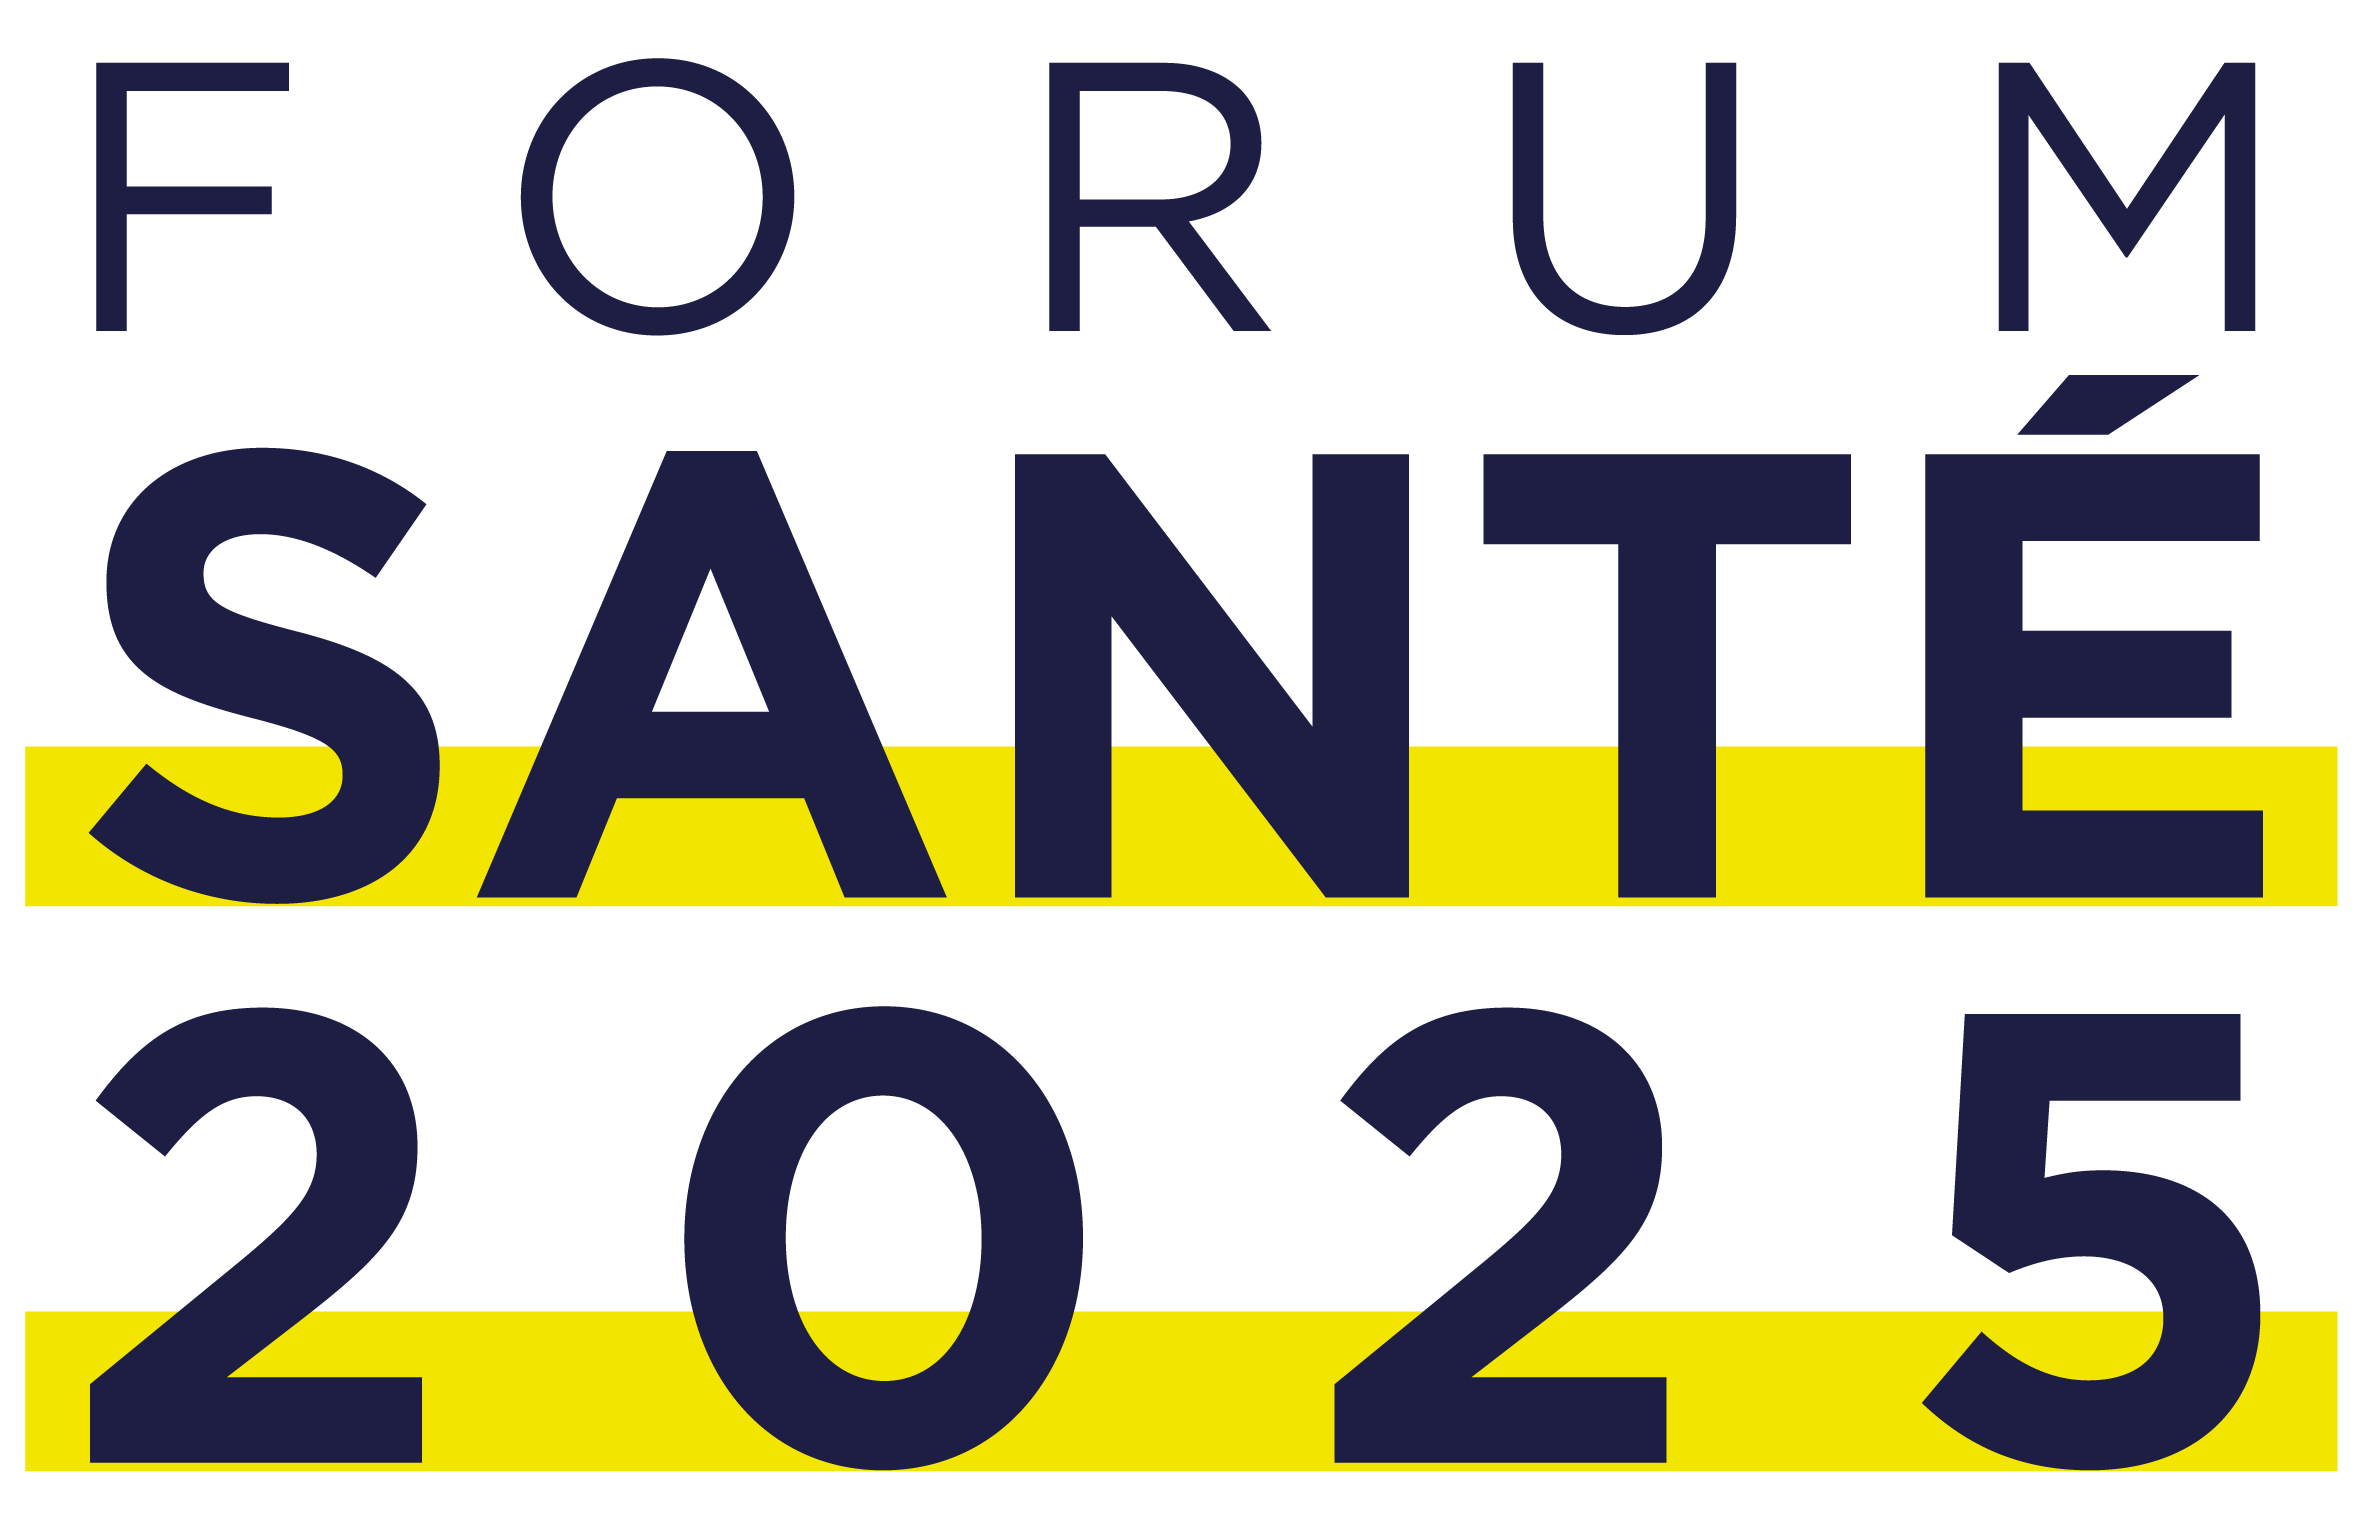 FORUM SANTE 2025